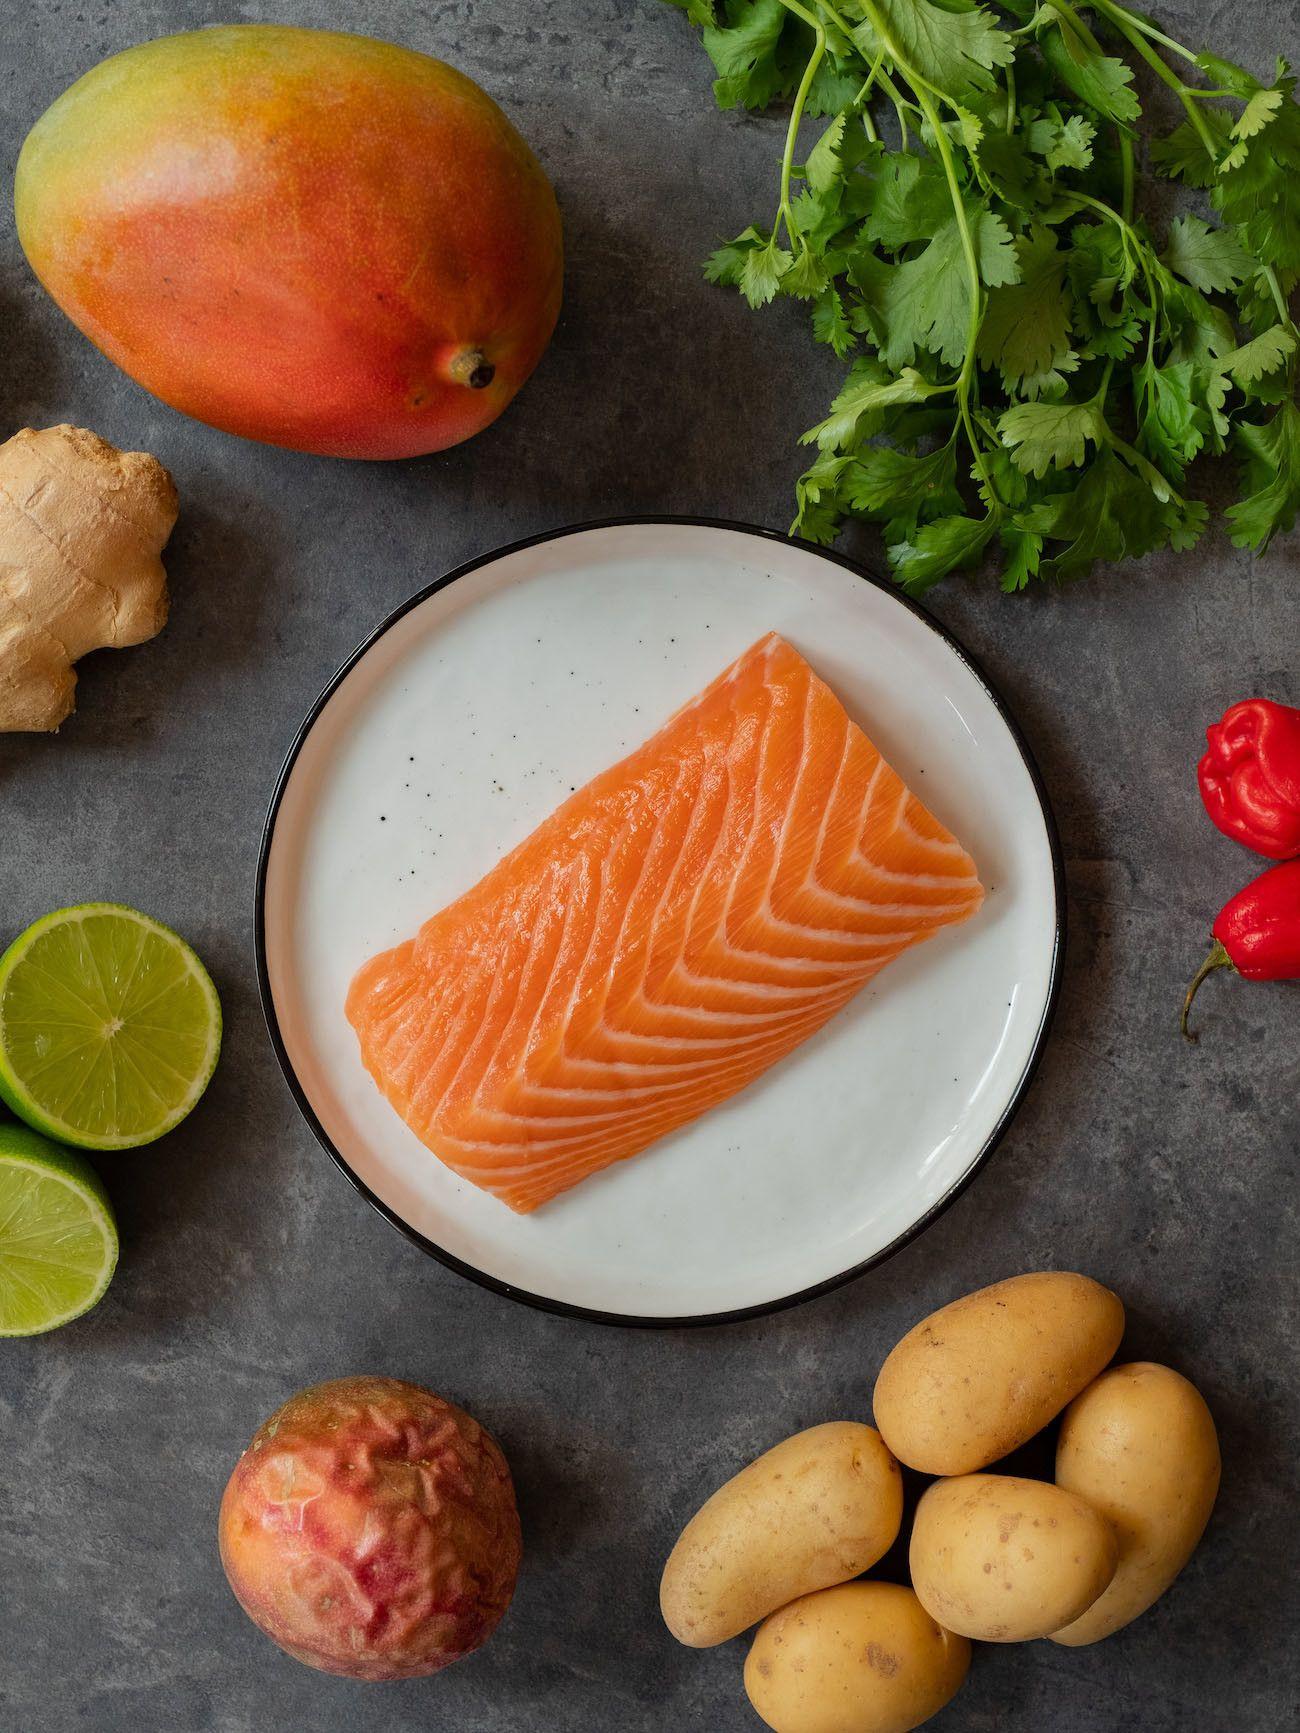 Foodblog, About Fuel, CEVICHE Das Kochbuch, Juan Danilo, Zutaten, Lachs, Mango